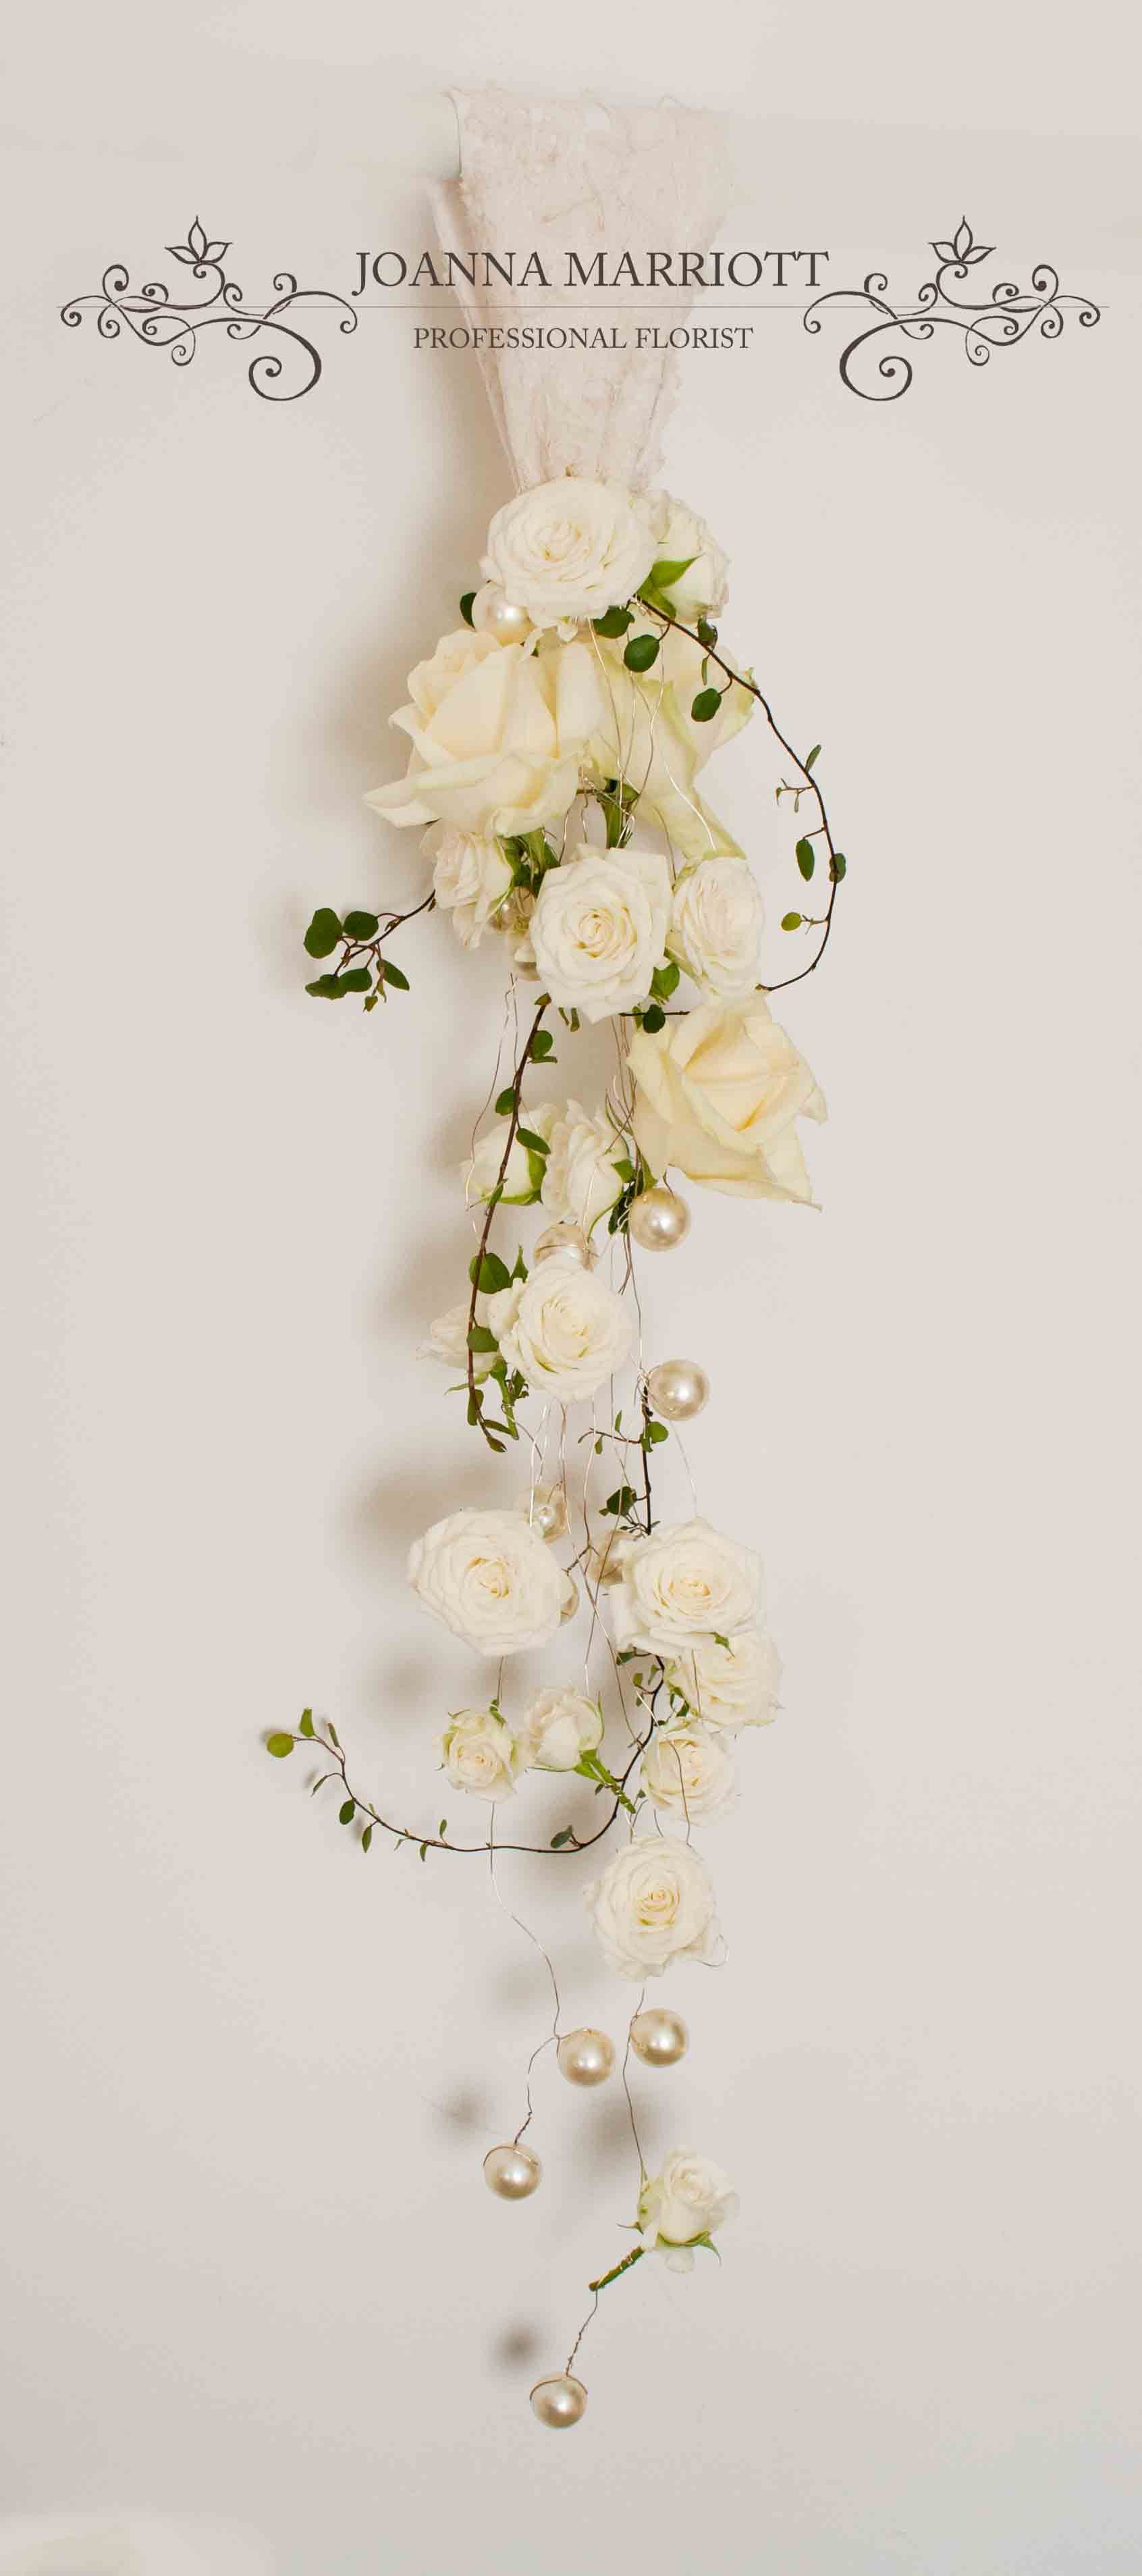 Wrist Bridal Bouquet Long Trailing Bridal Bouquet Made Of White